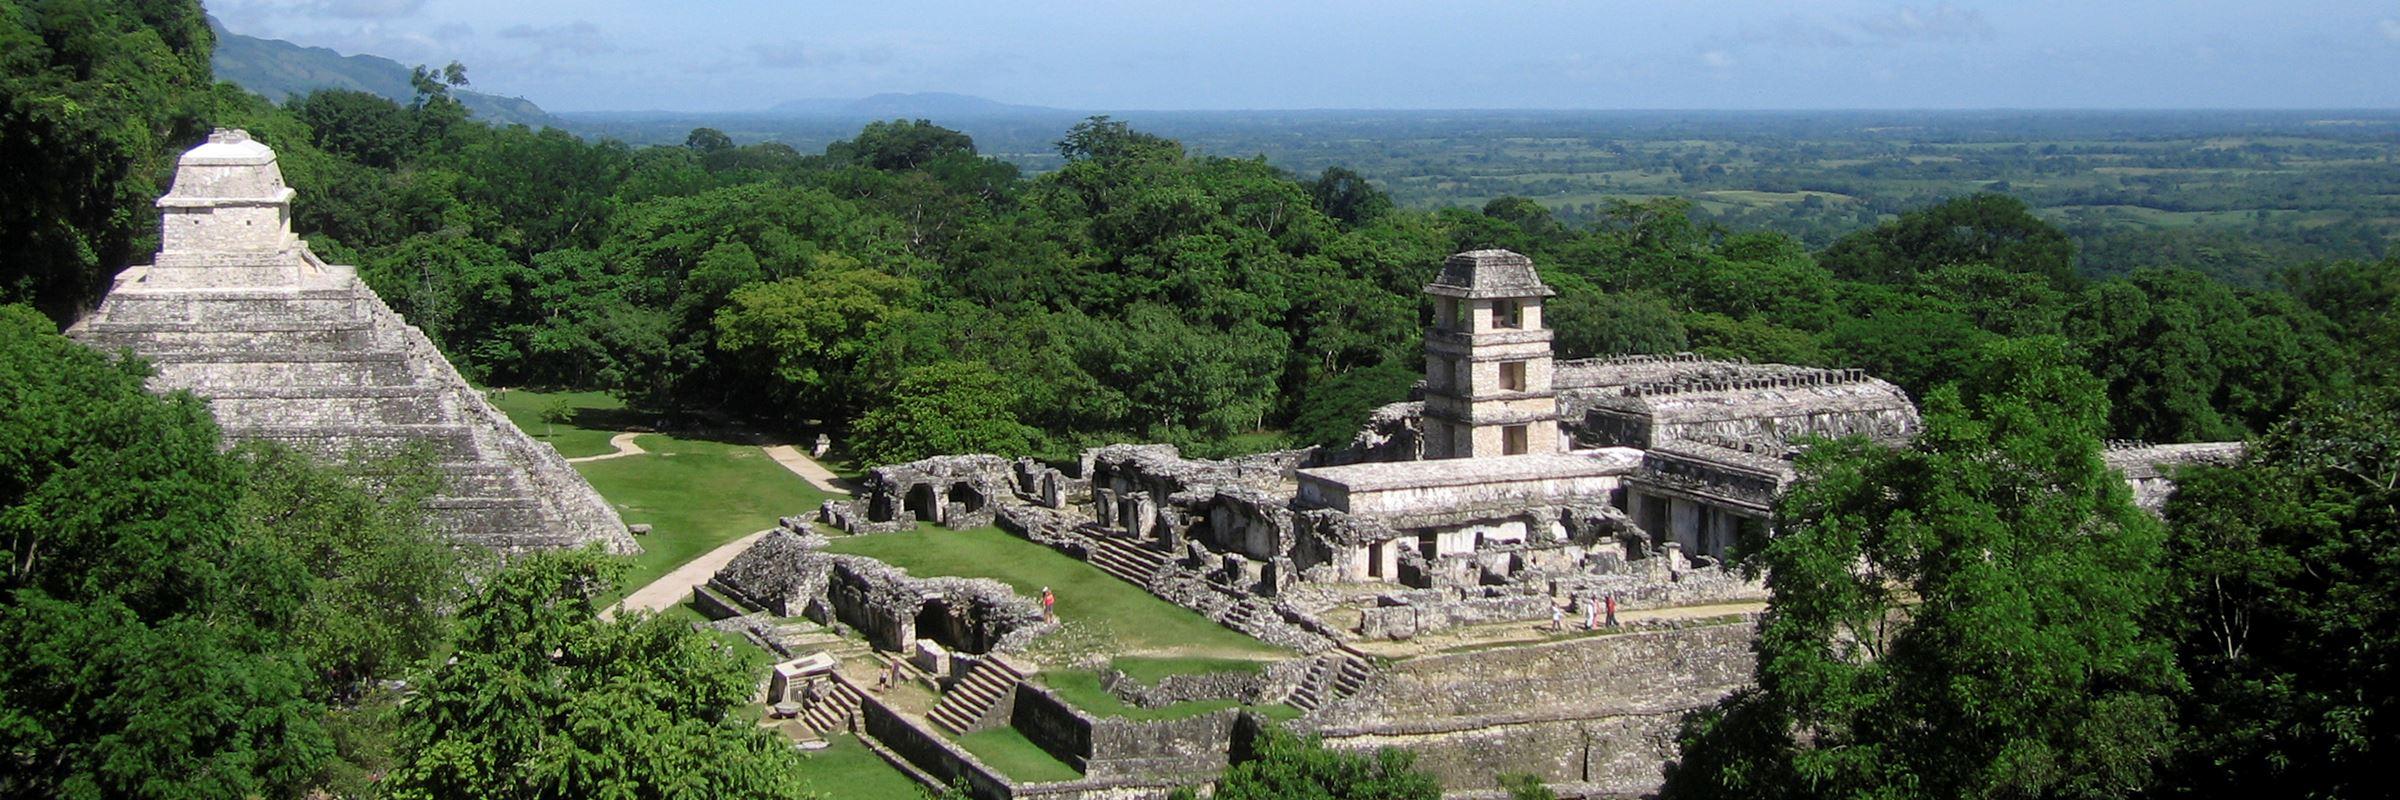 Mesoamericas Ancient Cities